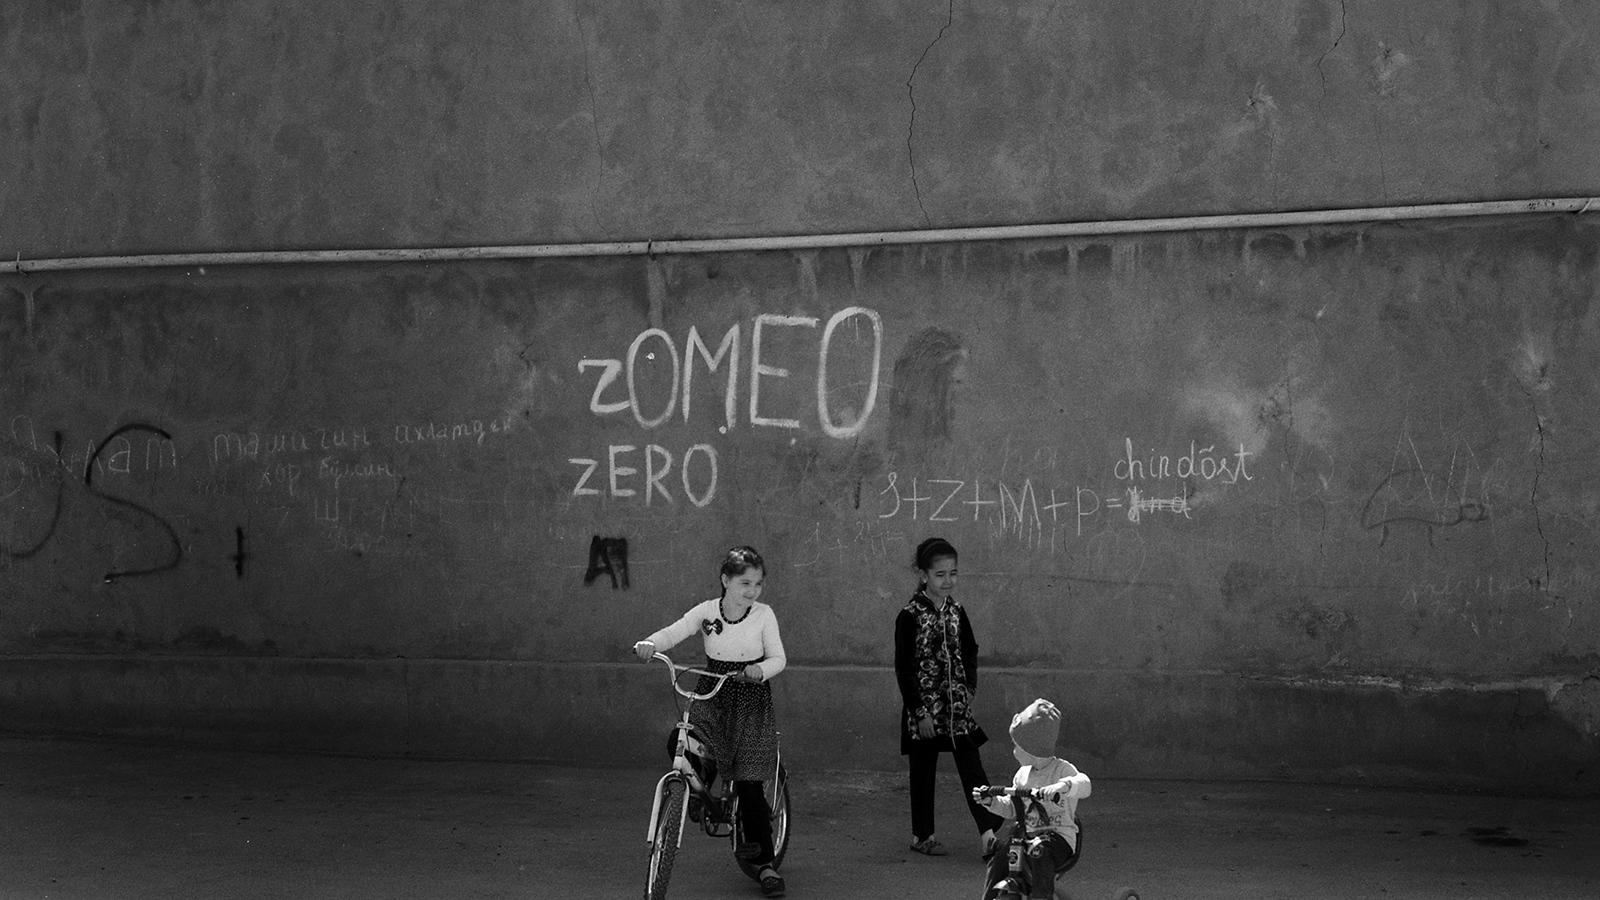 Zomeo Zero, Old Tashkent